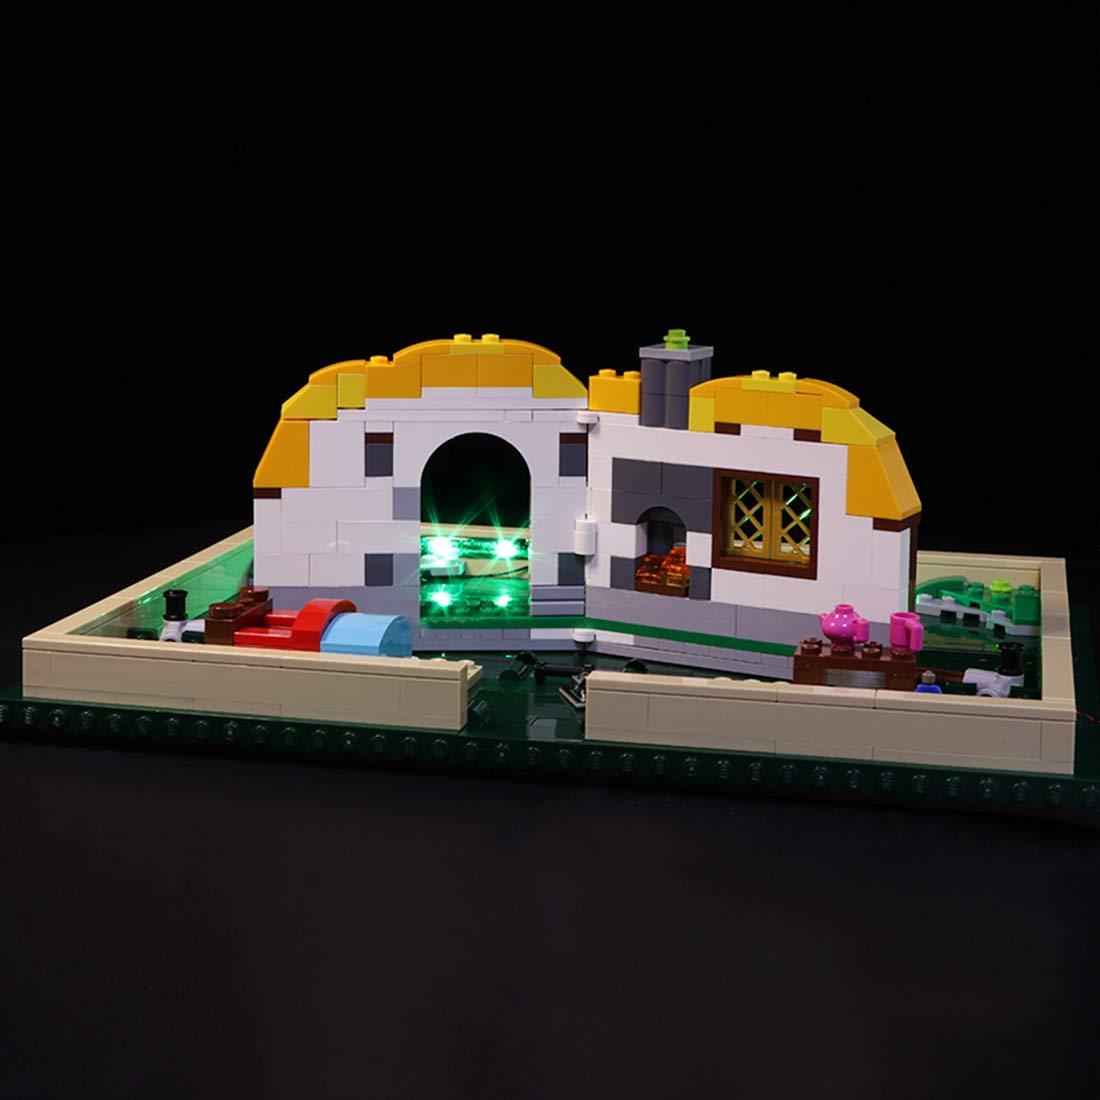 Poxl LED Beleuchtung Für Pop-Up-Buch LED Light LED Licht Kit Kompatibel Mit Lego 21315 - Lego Modell Nicht Enthalten